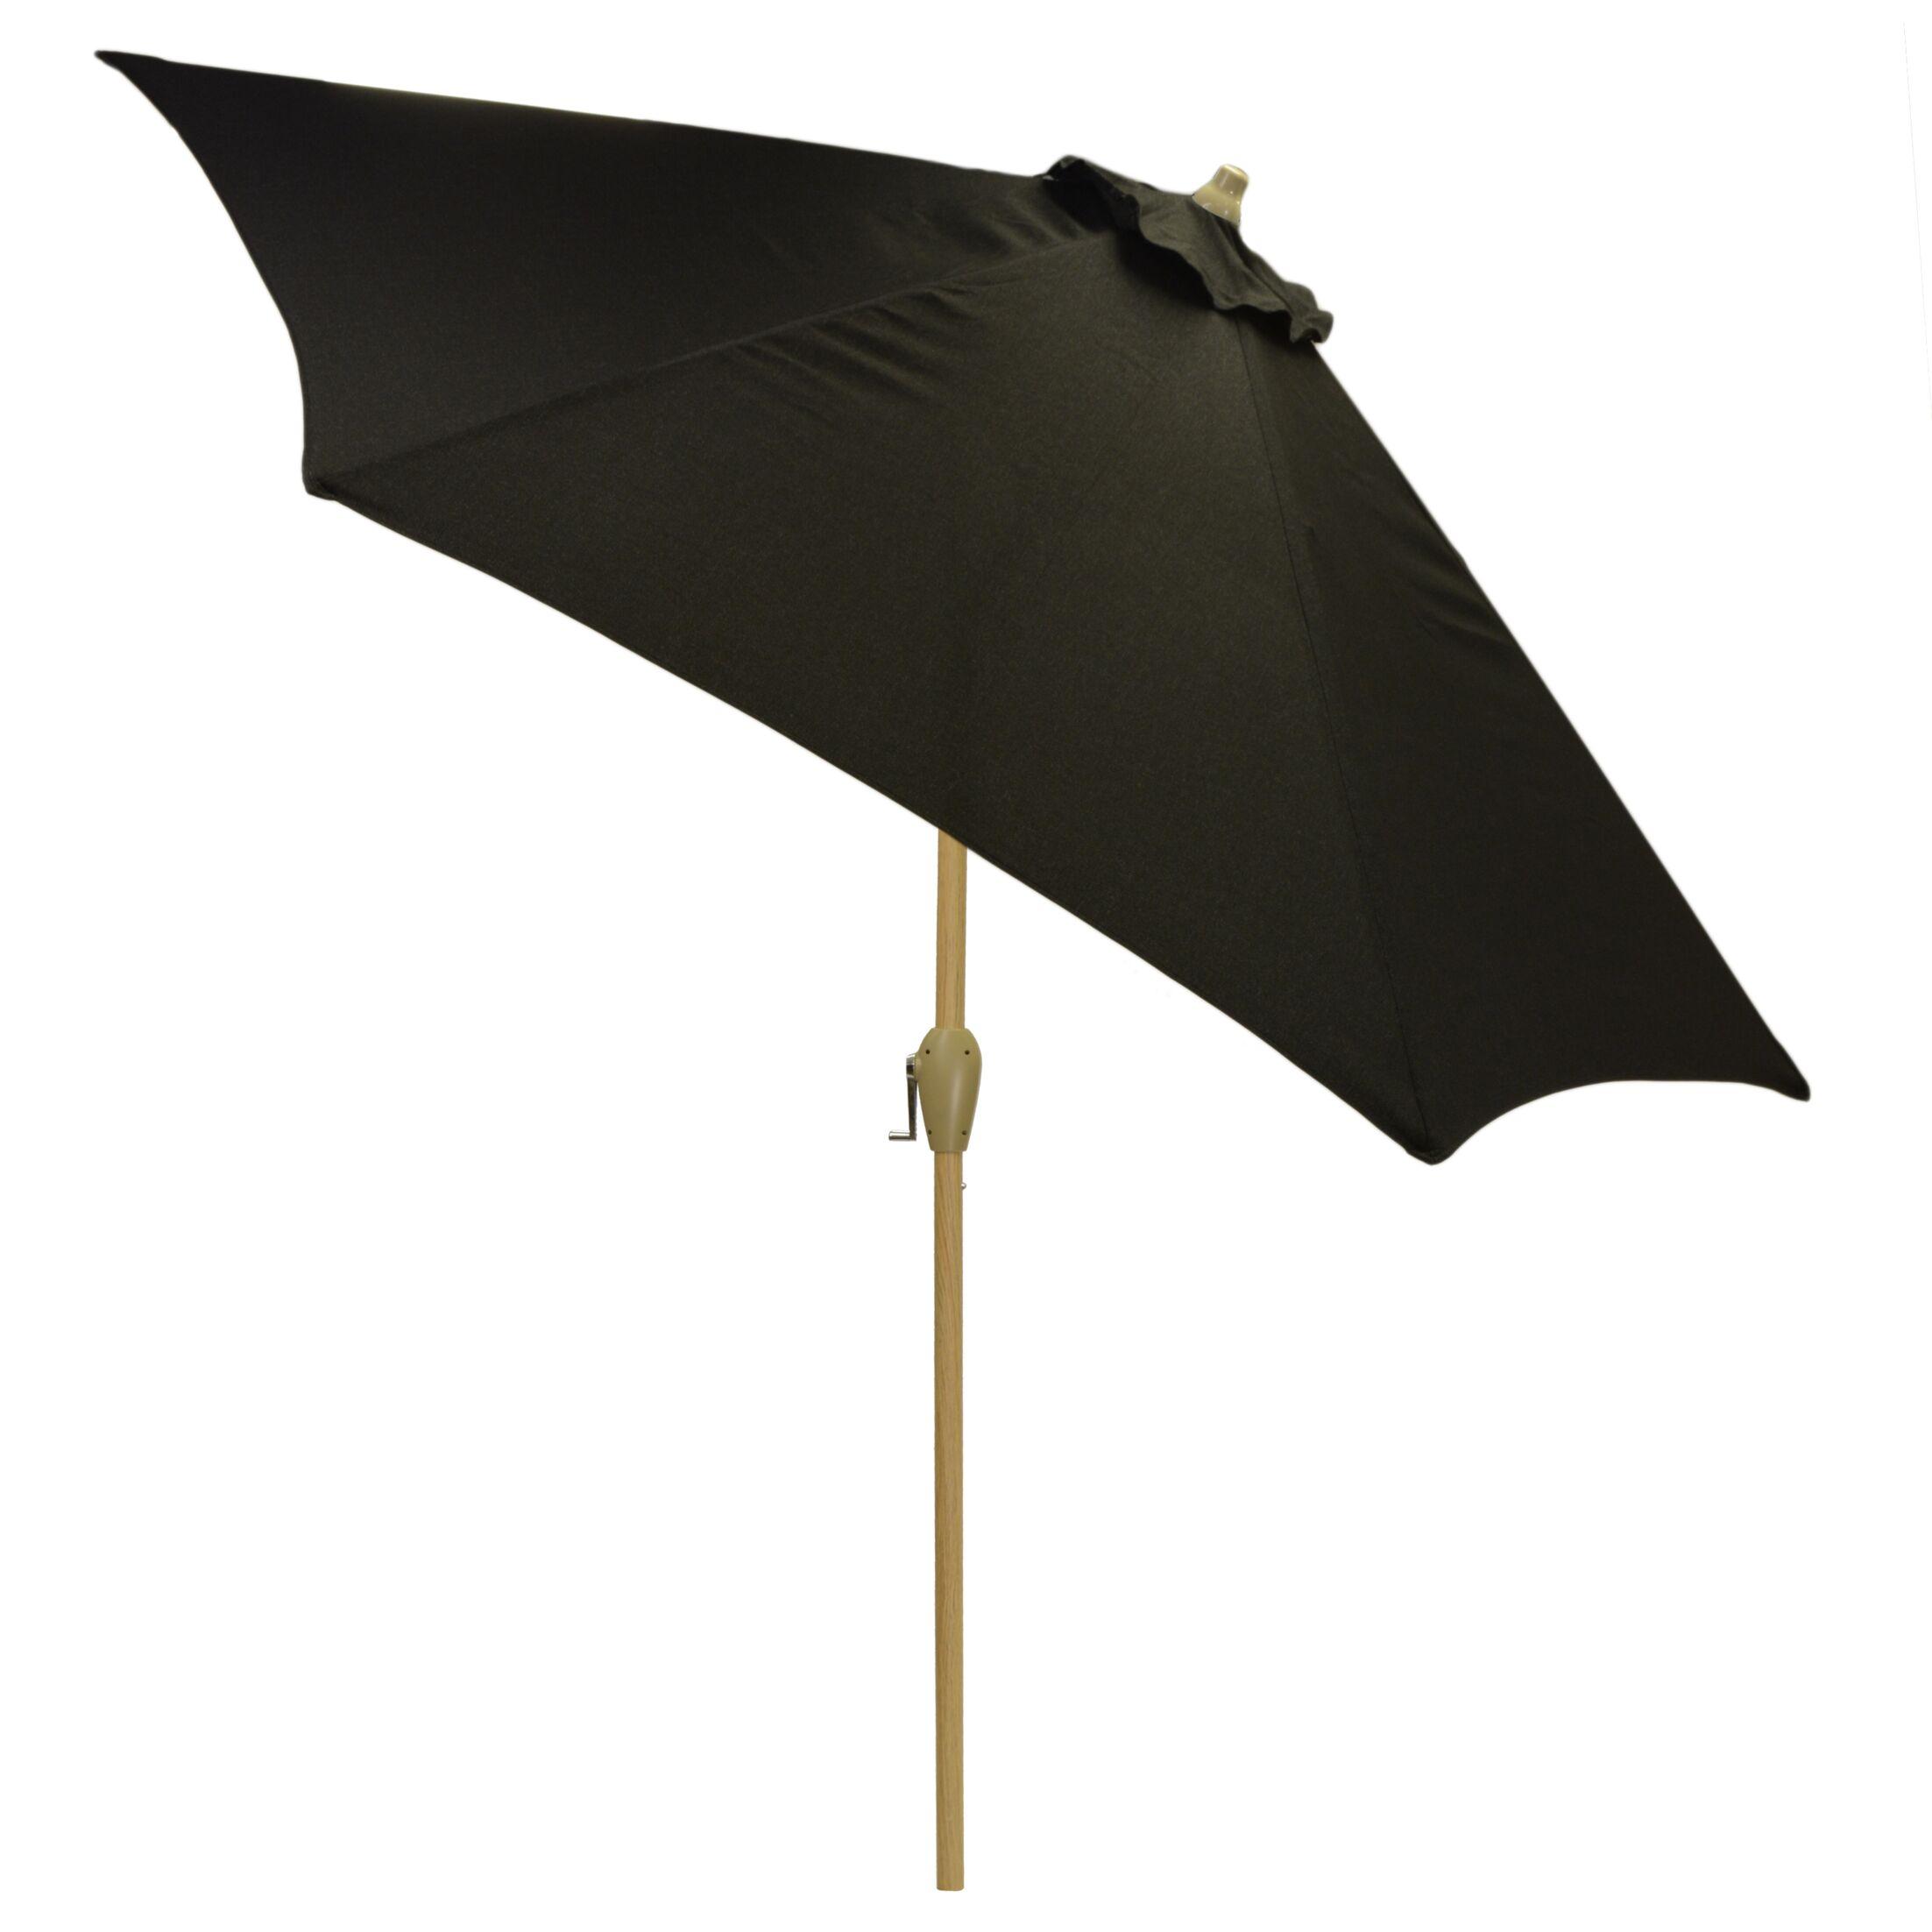 Hulme Solid 8.9' Market Umbrella Fabric Color: Black